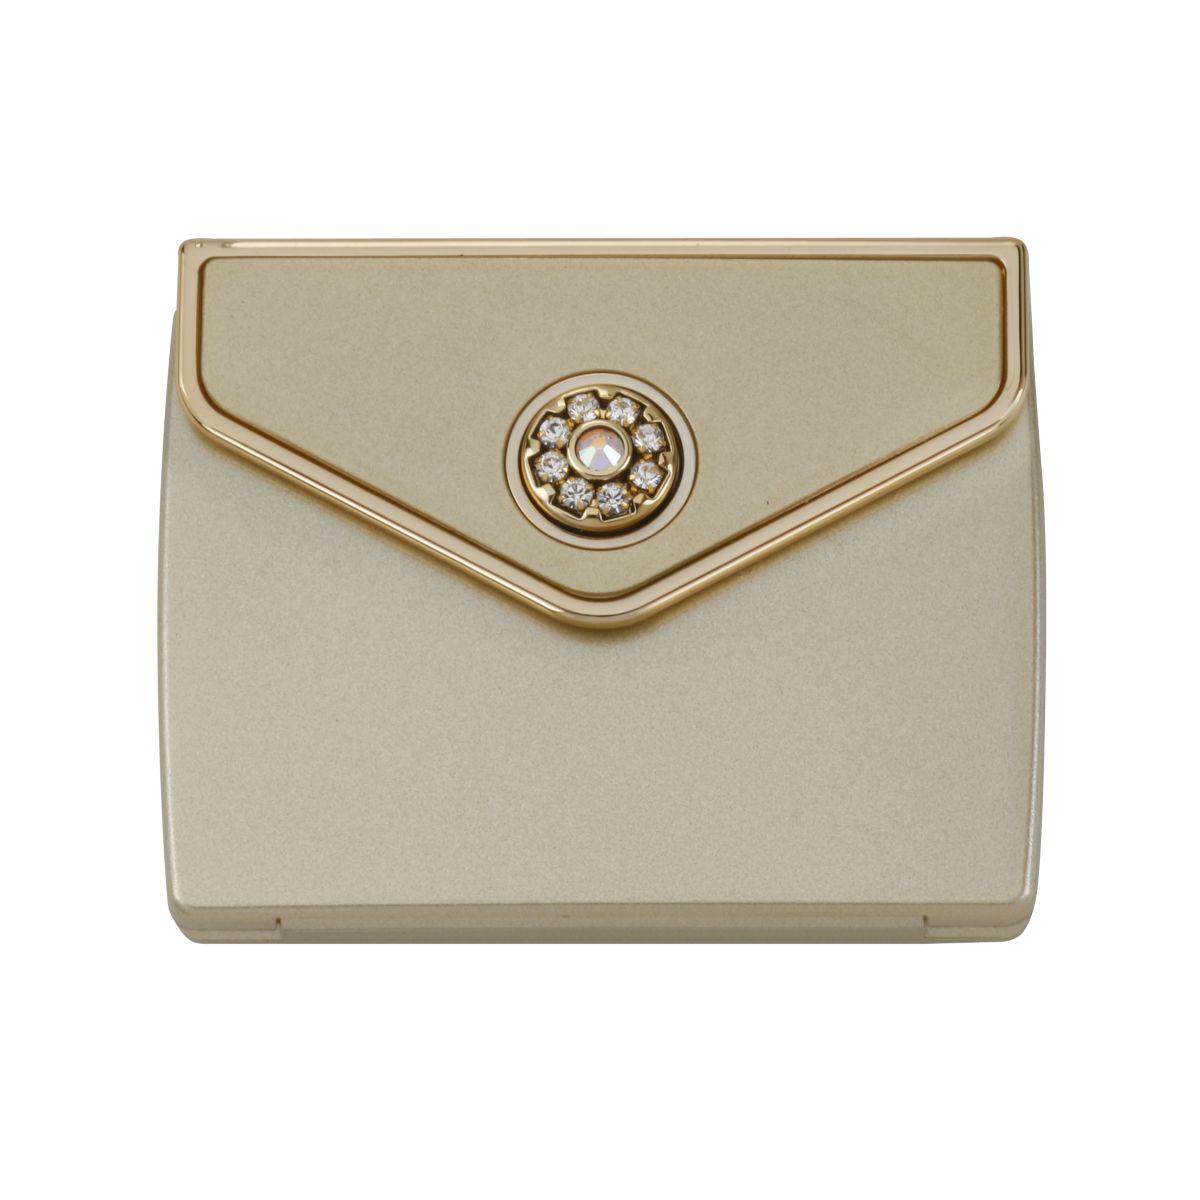 MC 336 gld - Tri Fold Envelope 5x Mirror Compact with Swarovski Crystal Elements - MC336GOLD